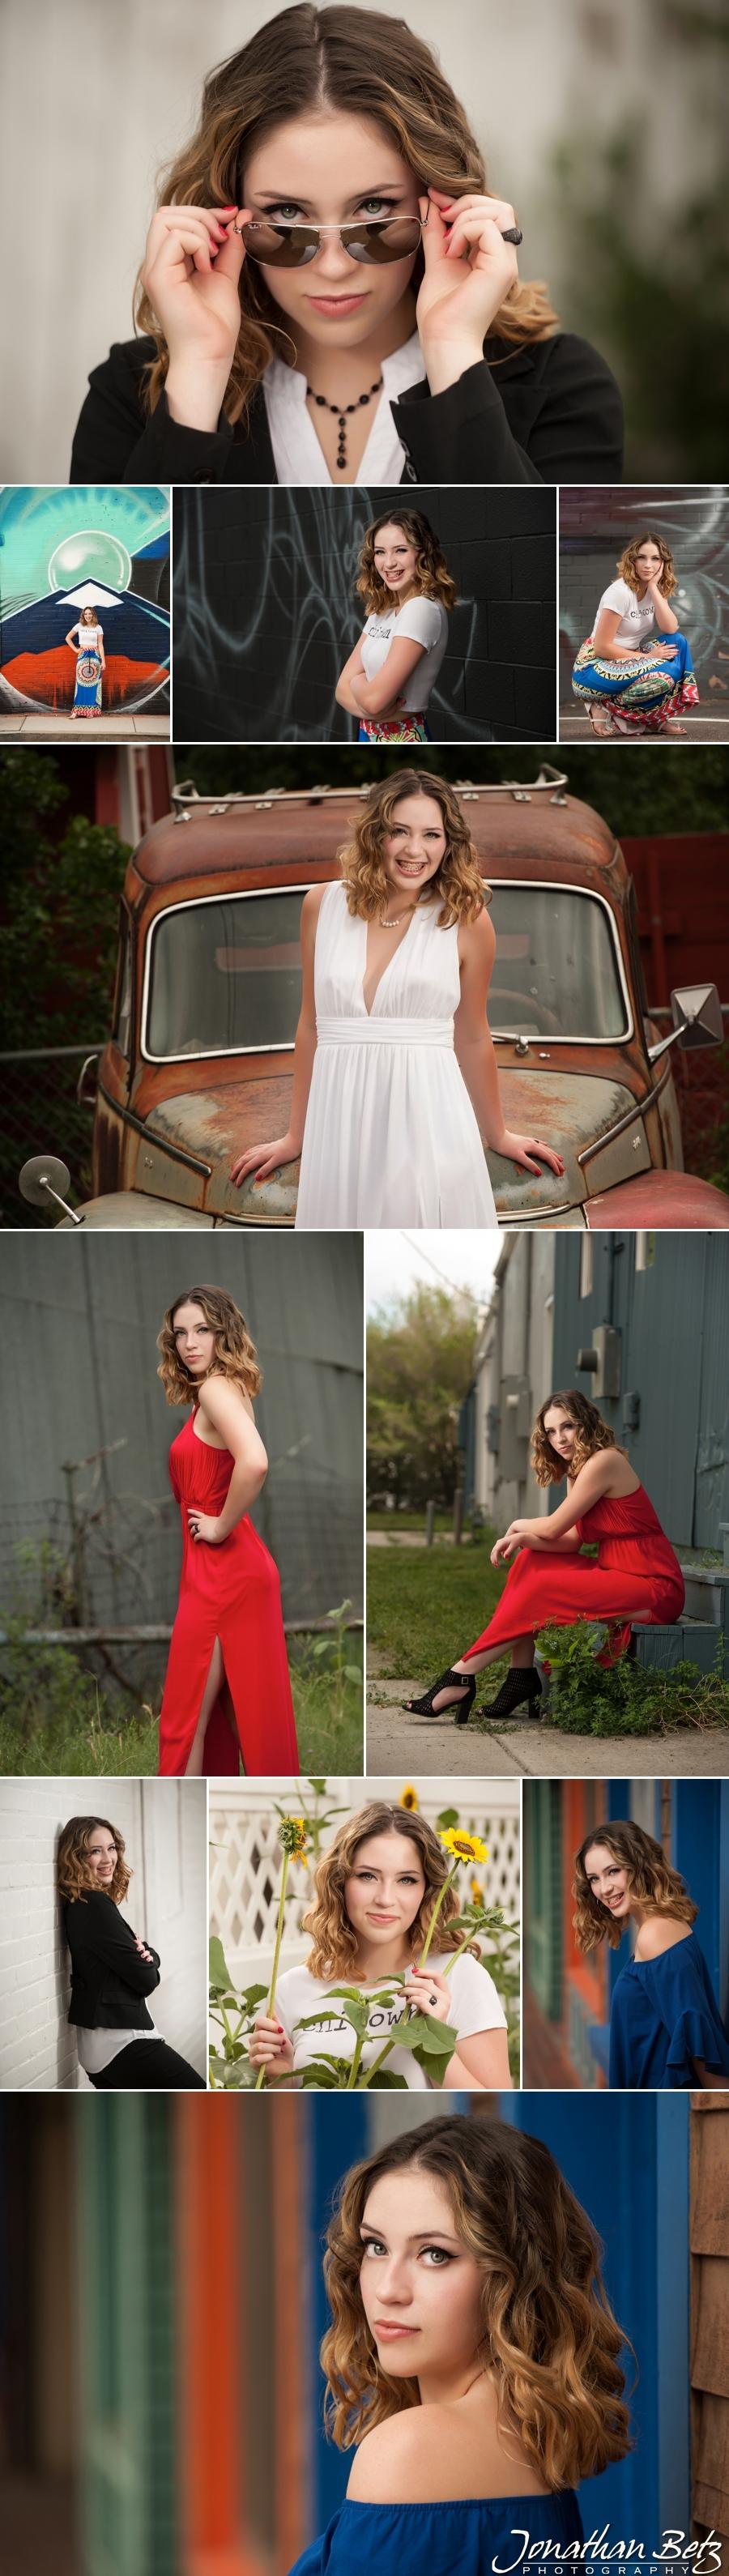 Jonathan Betz Photography High School Senior Pictures Photography